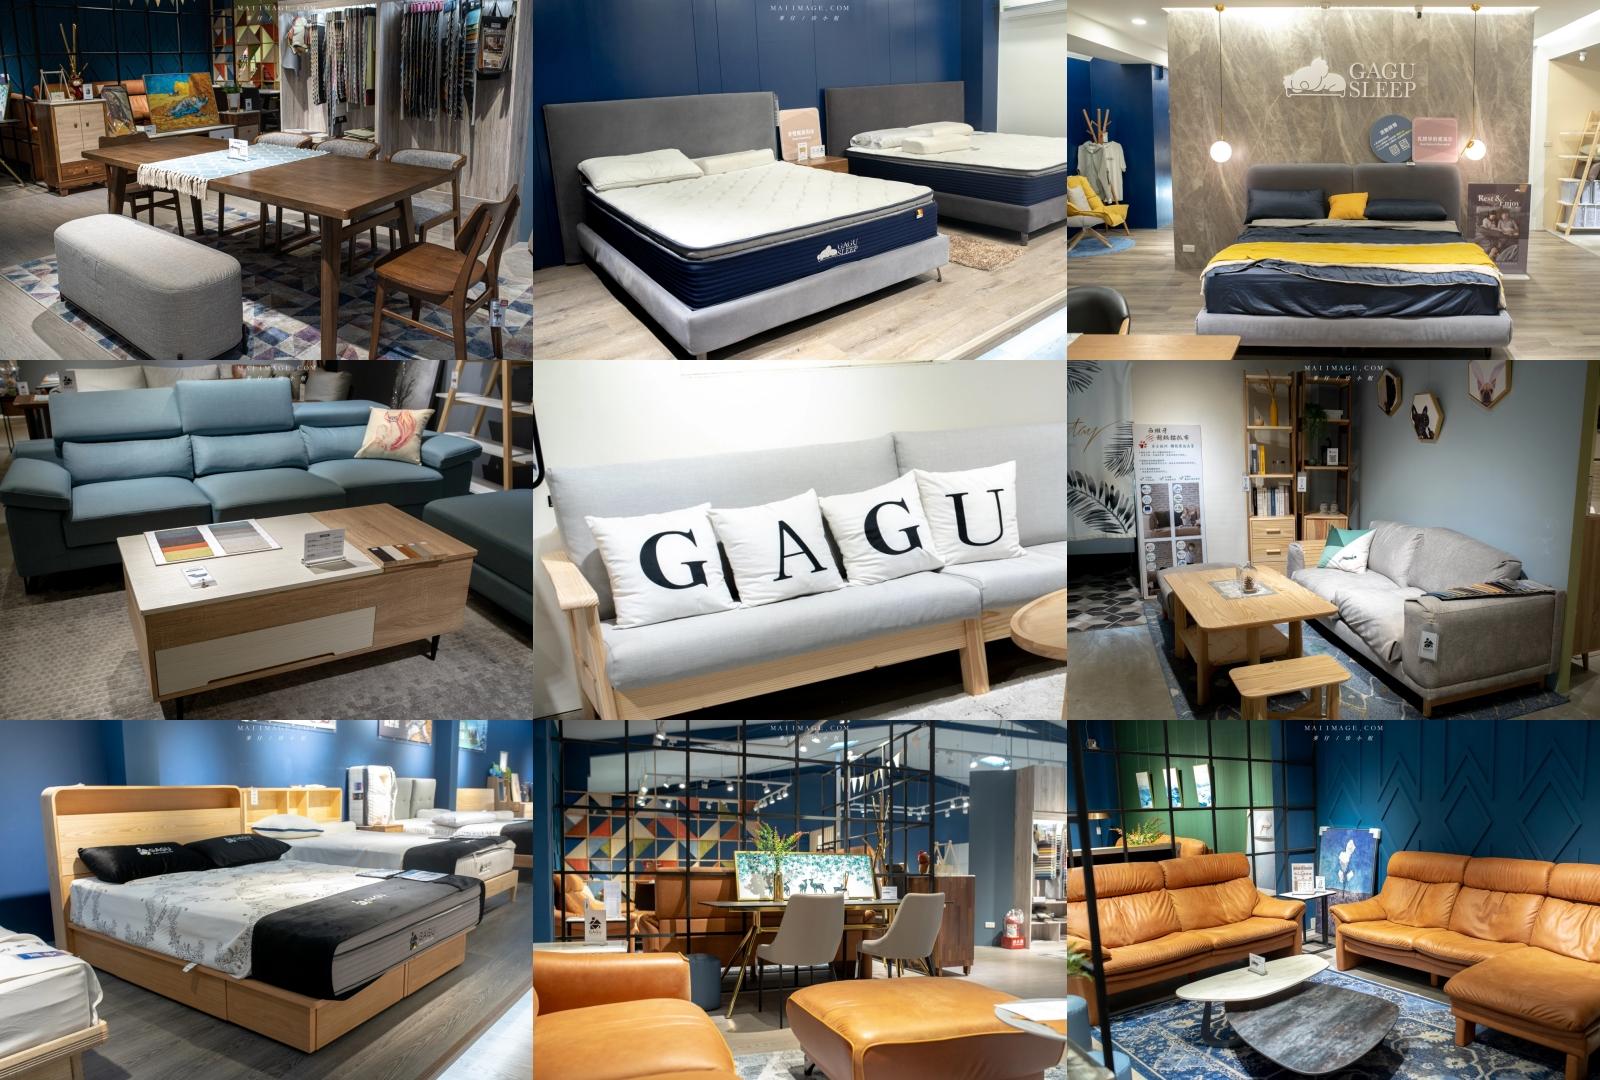 GAGU北歐家具工廠|現在最夯的GAGU SLEEP你聽過嗎?100晚試躺活動開跑,送到你家免運費、五股家具工廠推薦